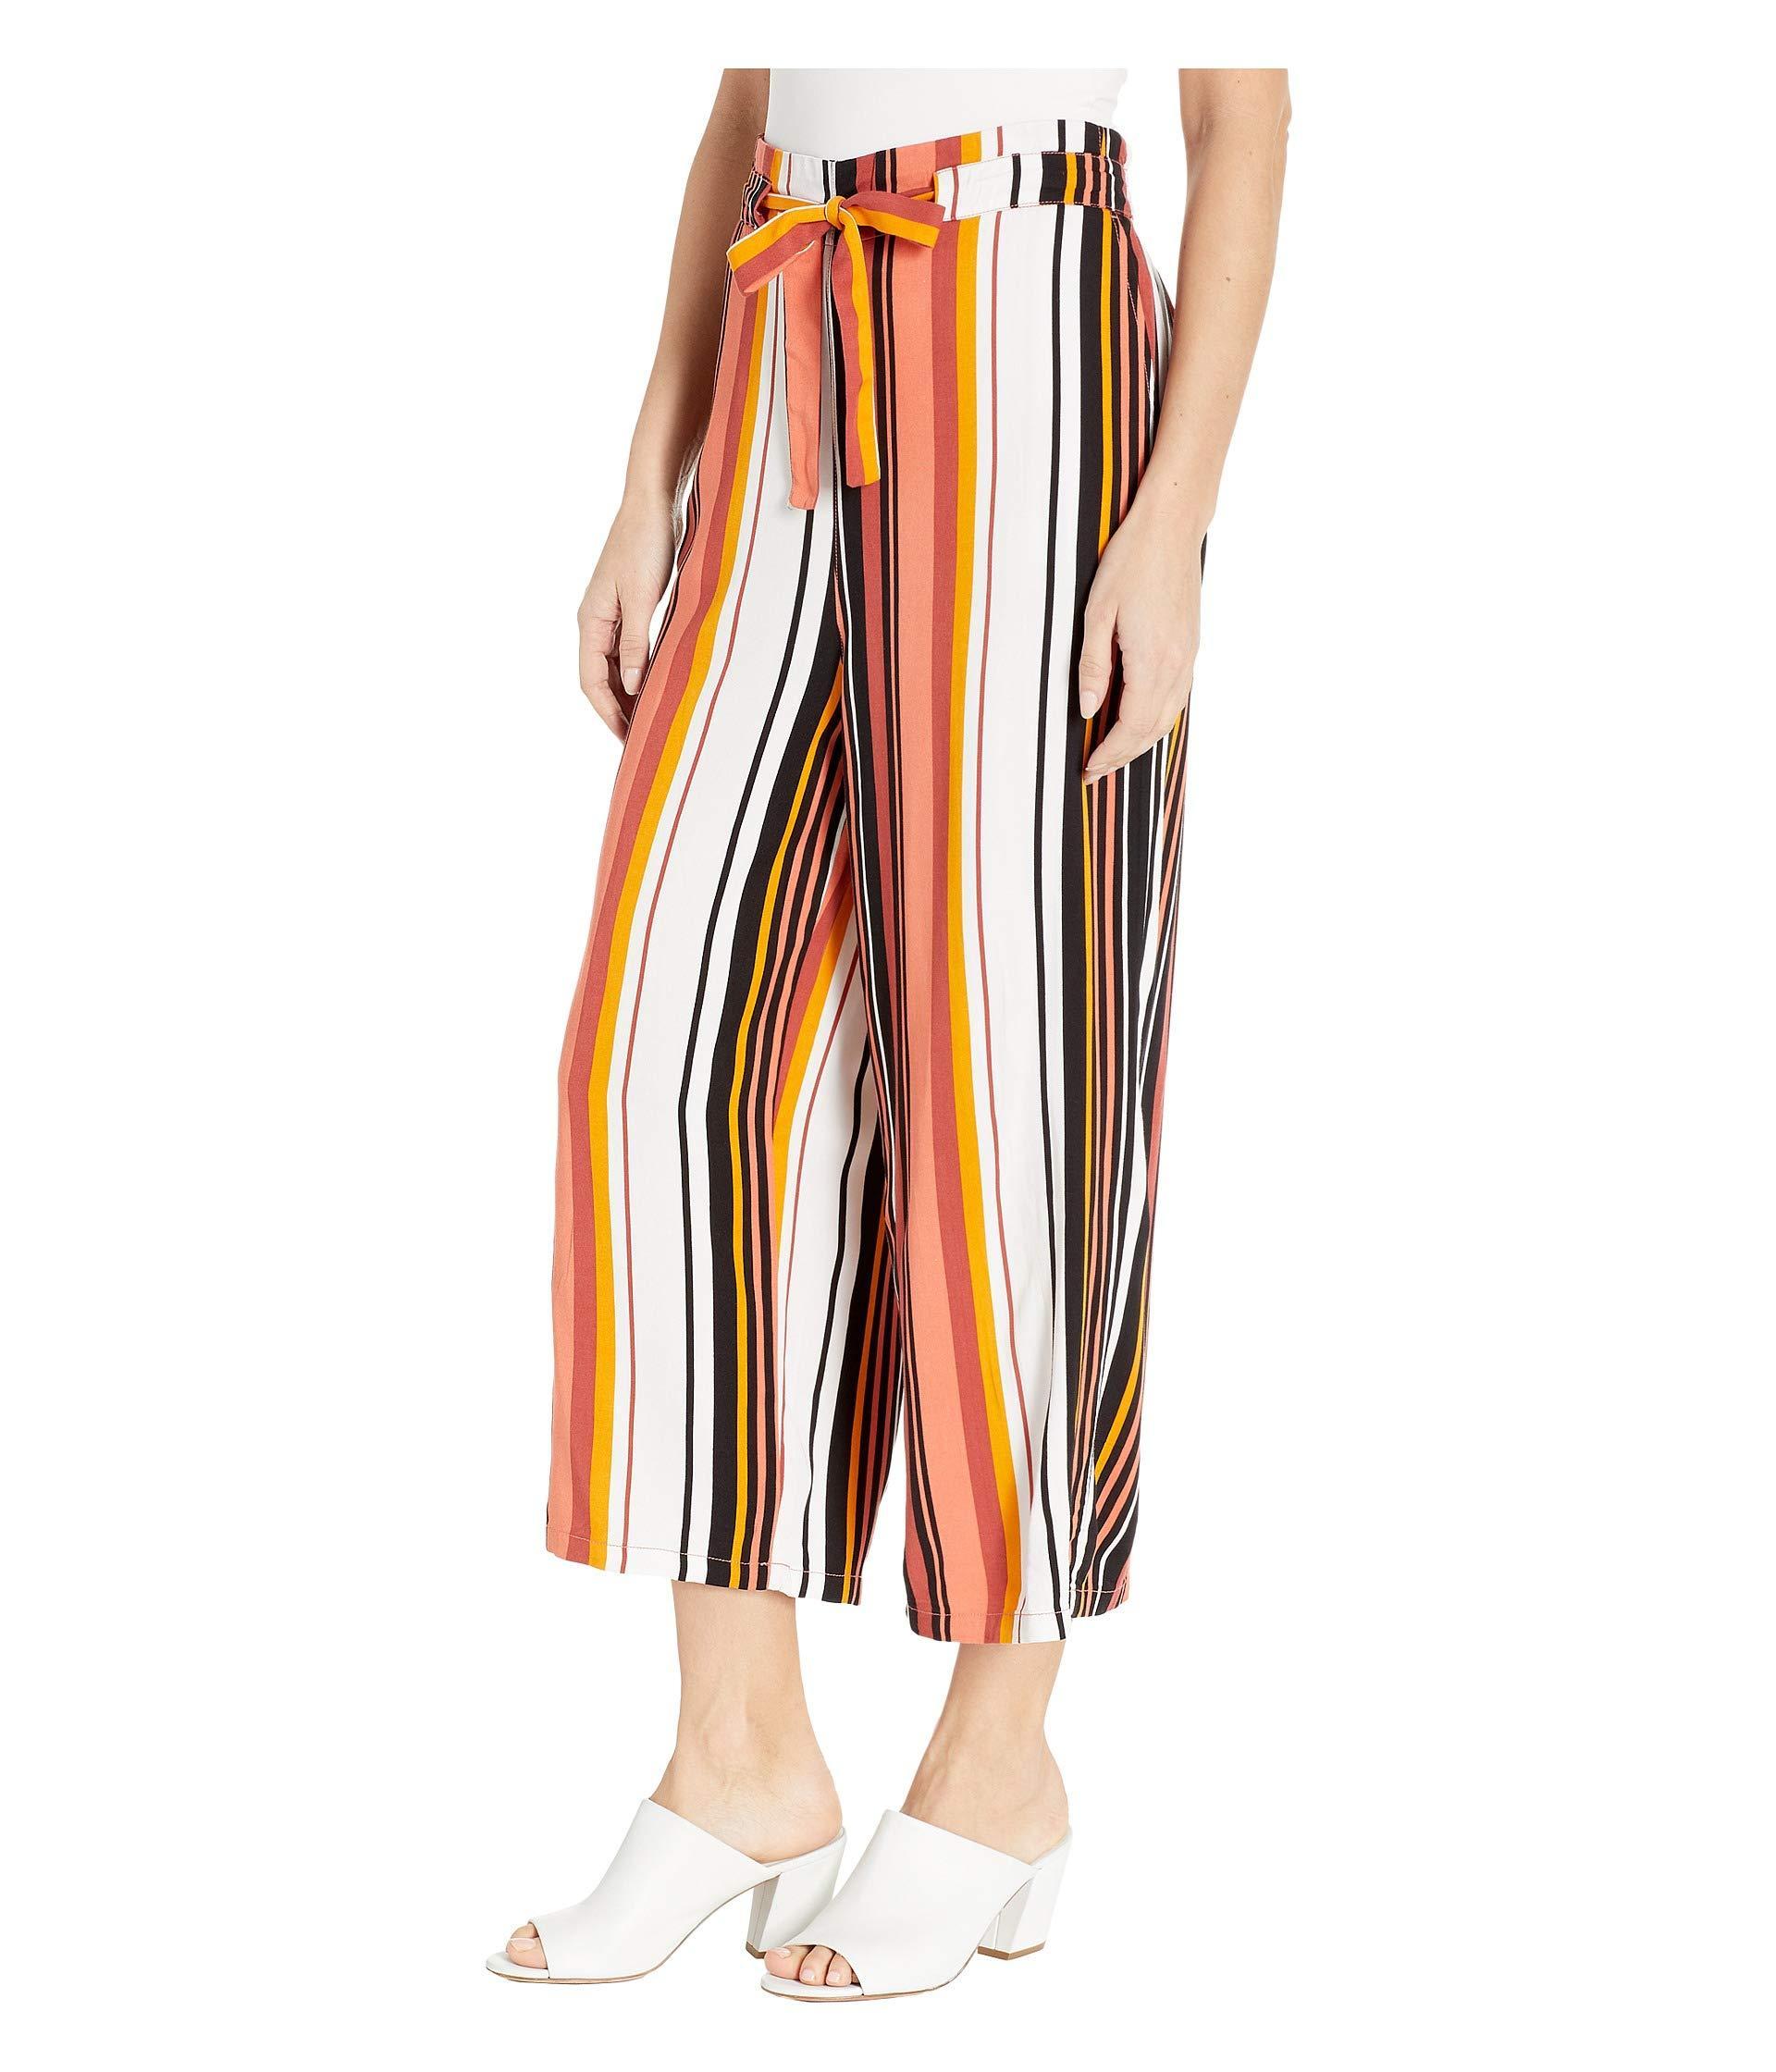 bfe1cf02566 Lyst - Volcom Winding Roads Pants (dark Clay) Women's Clothing in Orange